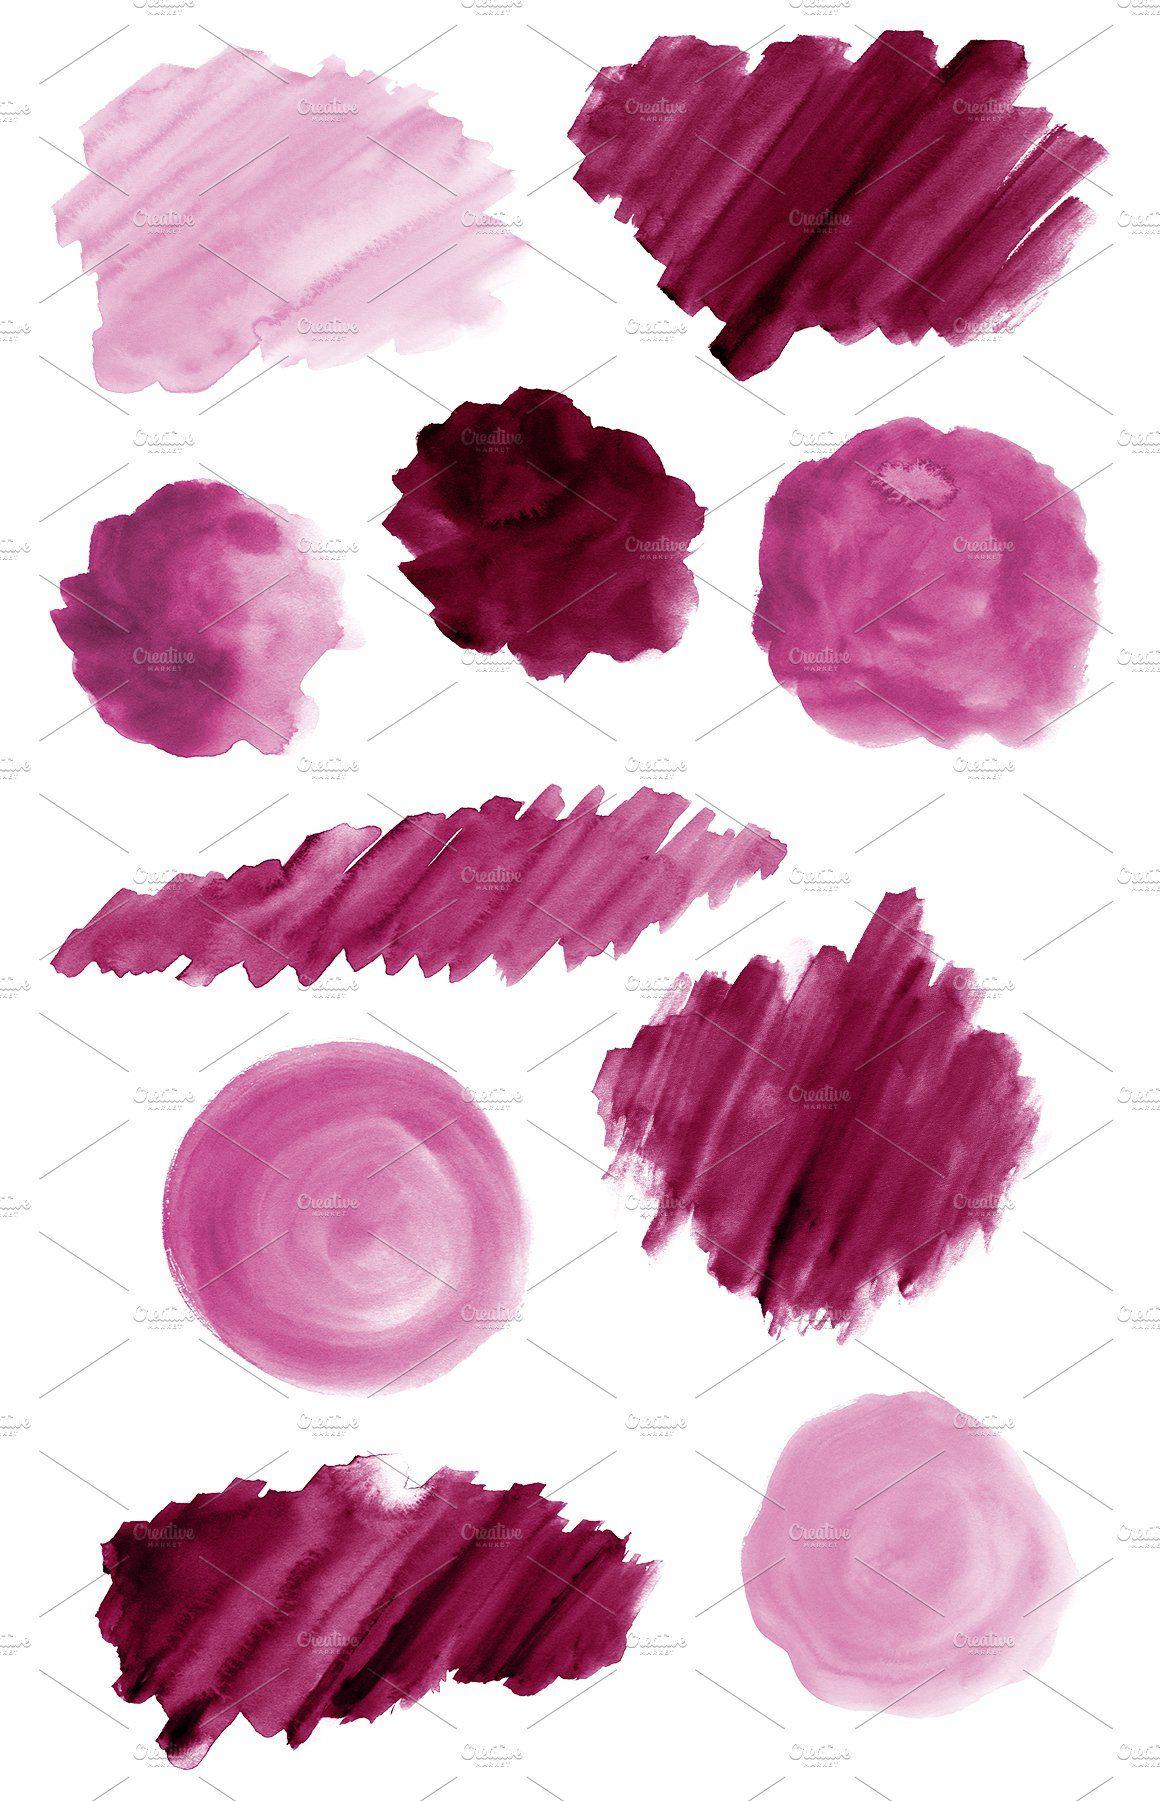 50 Pink Watercolor Shapes Ad Ad Splotches Circles Strokes